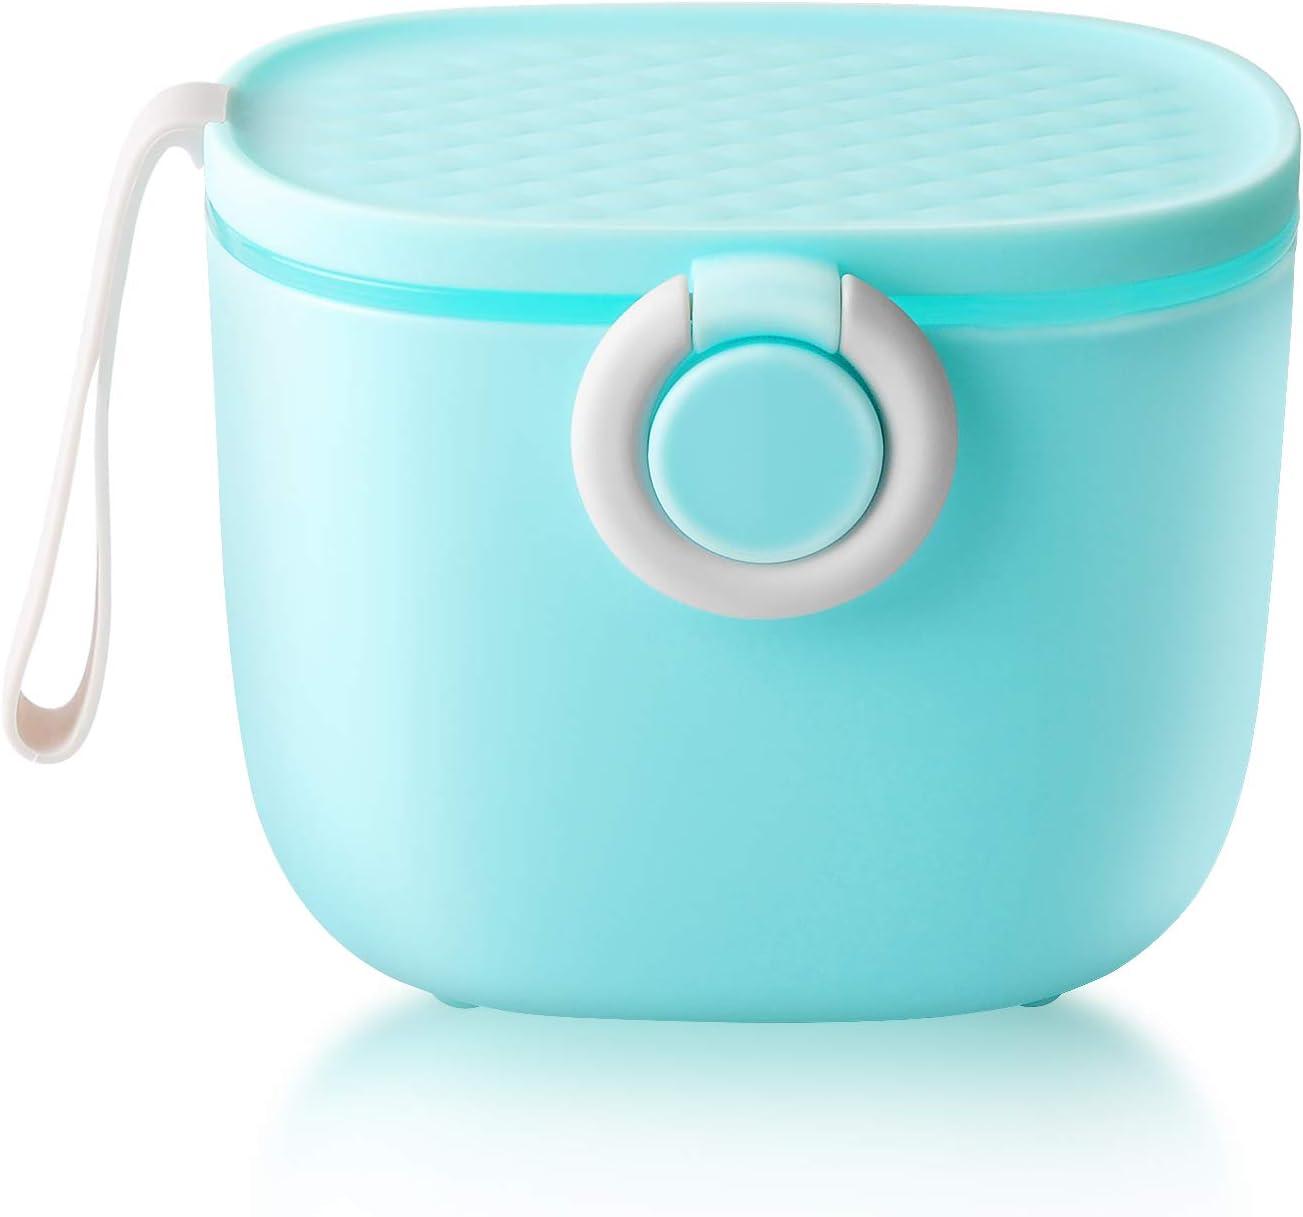 Portable Baby Milk Powder Formula Dispenser Container Pot Feeding Box Chic